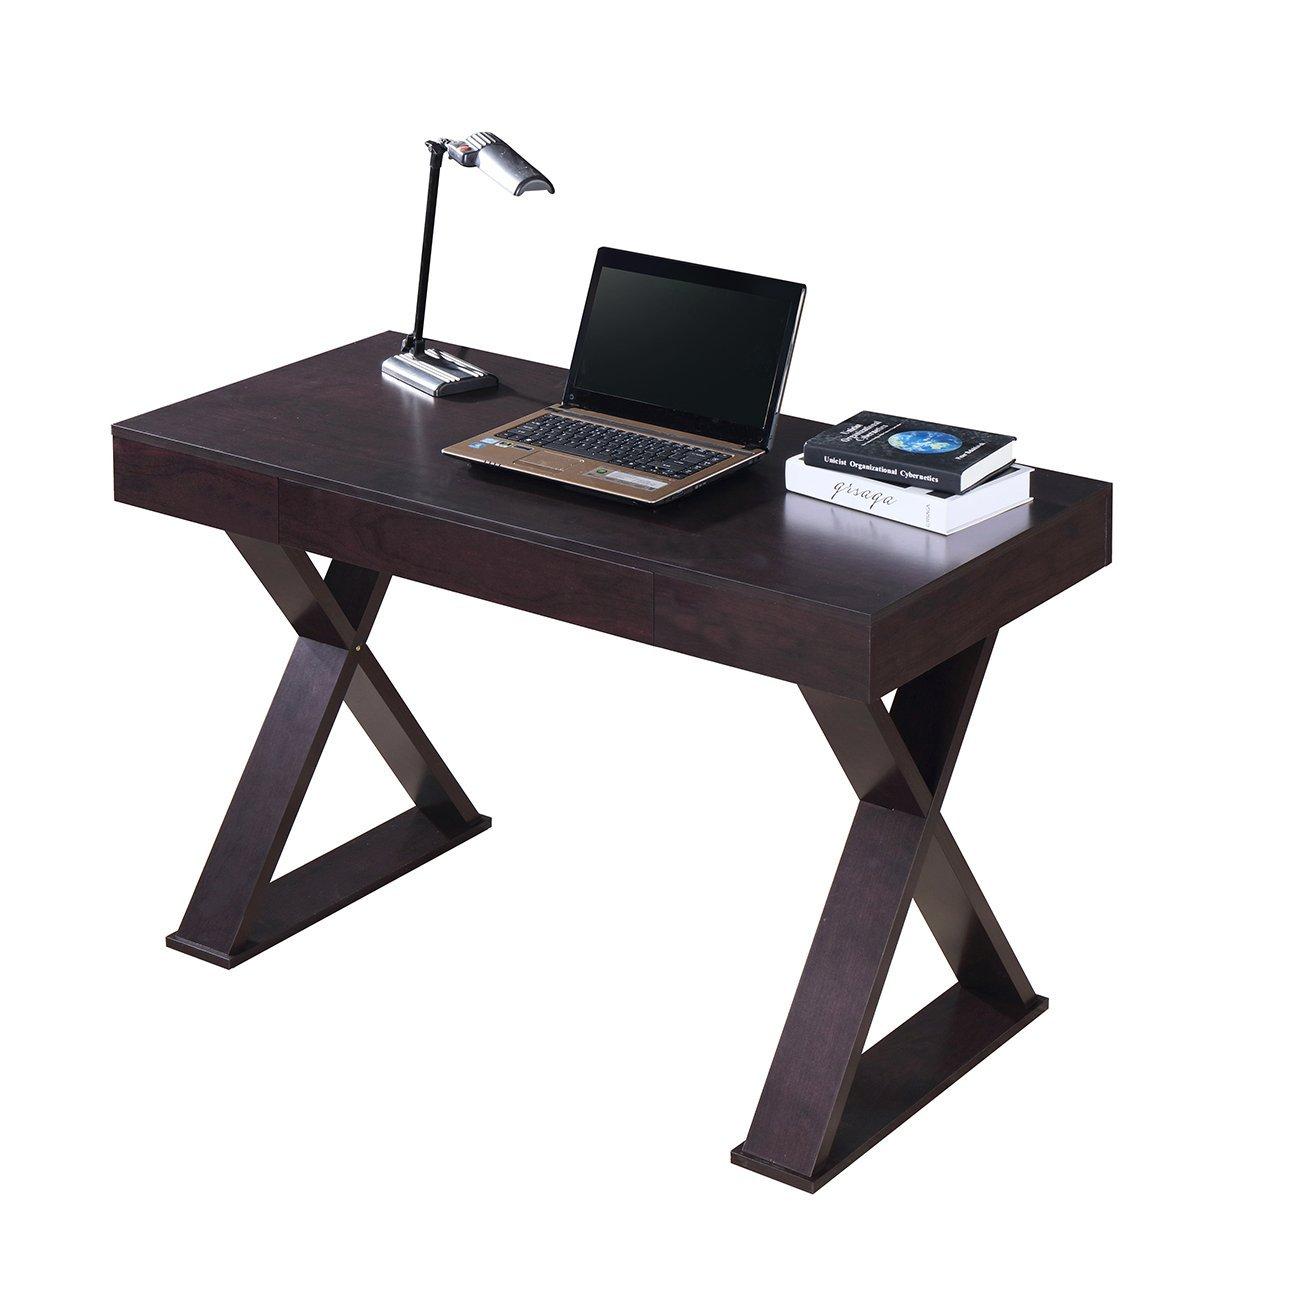 Techni Mobili | Techni Mobile | Techni Mobili Desk